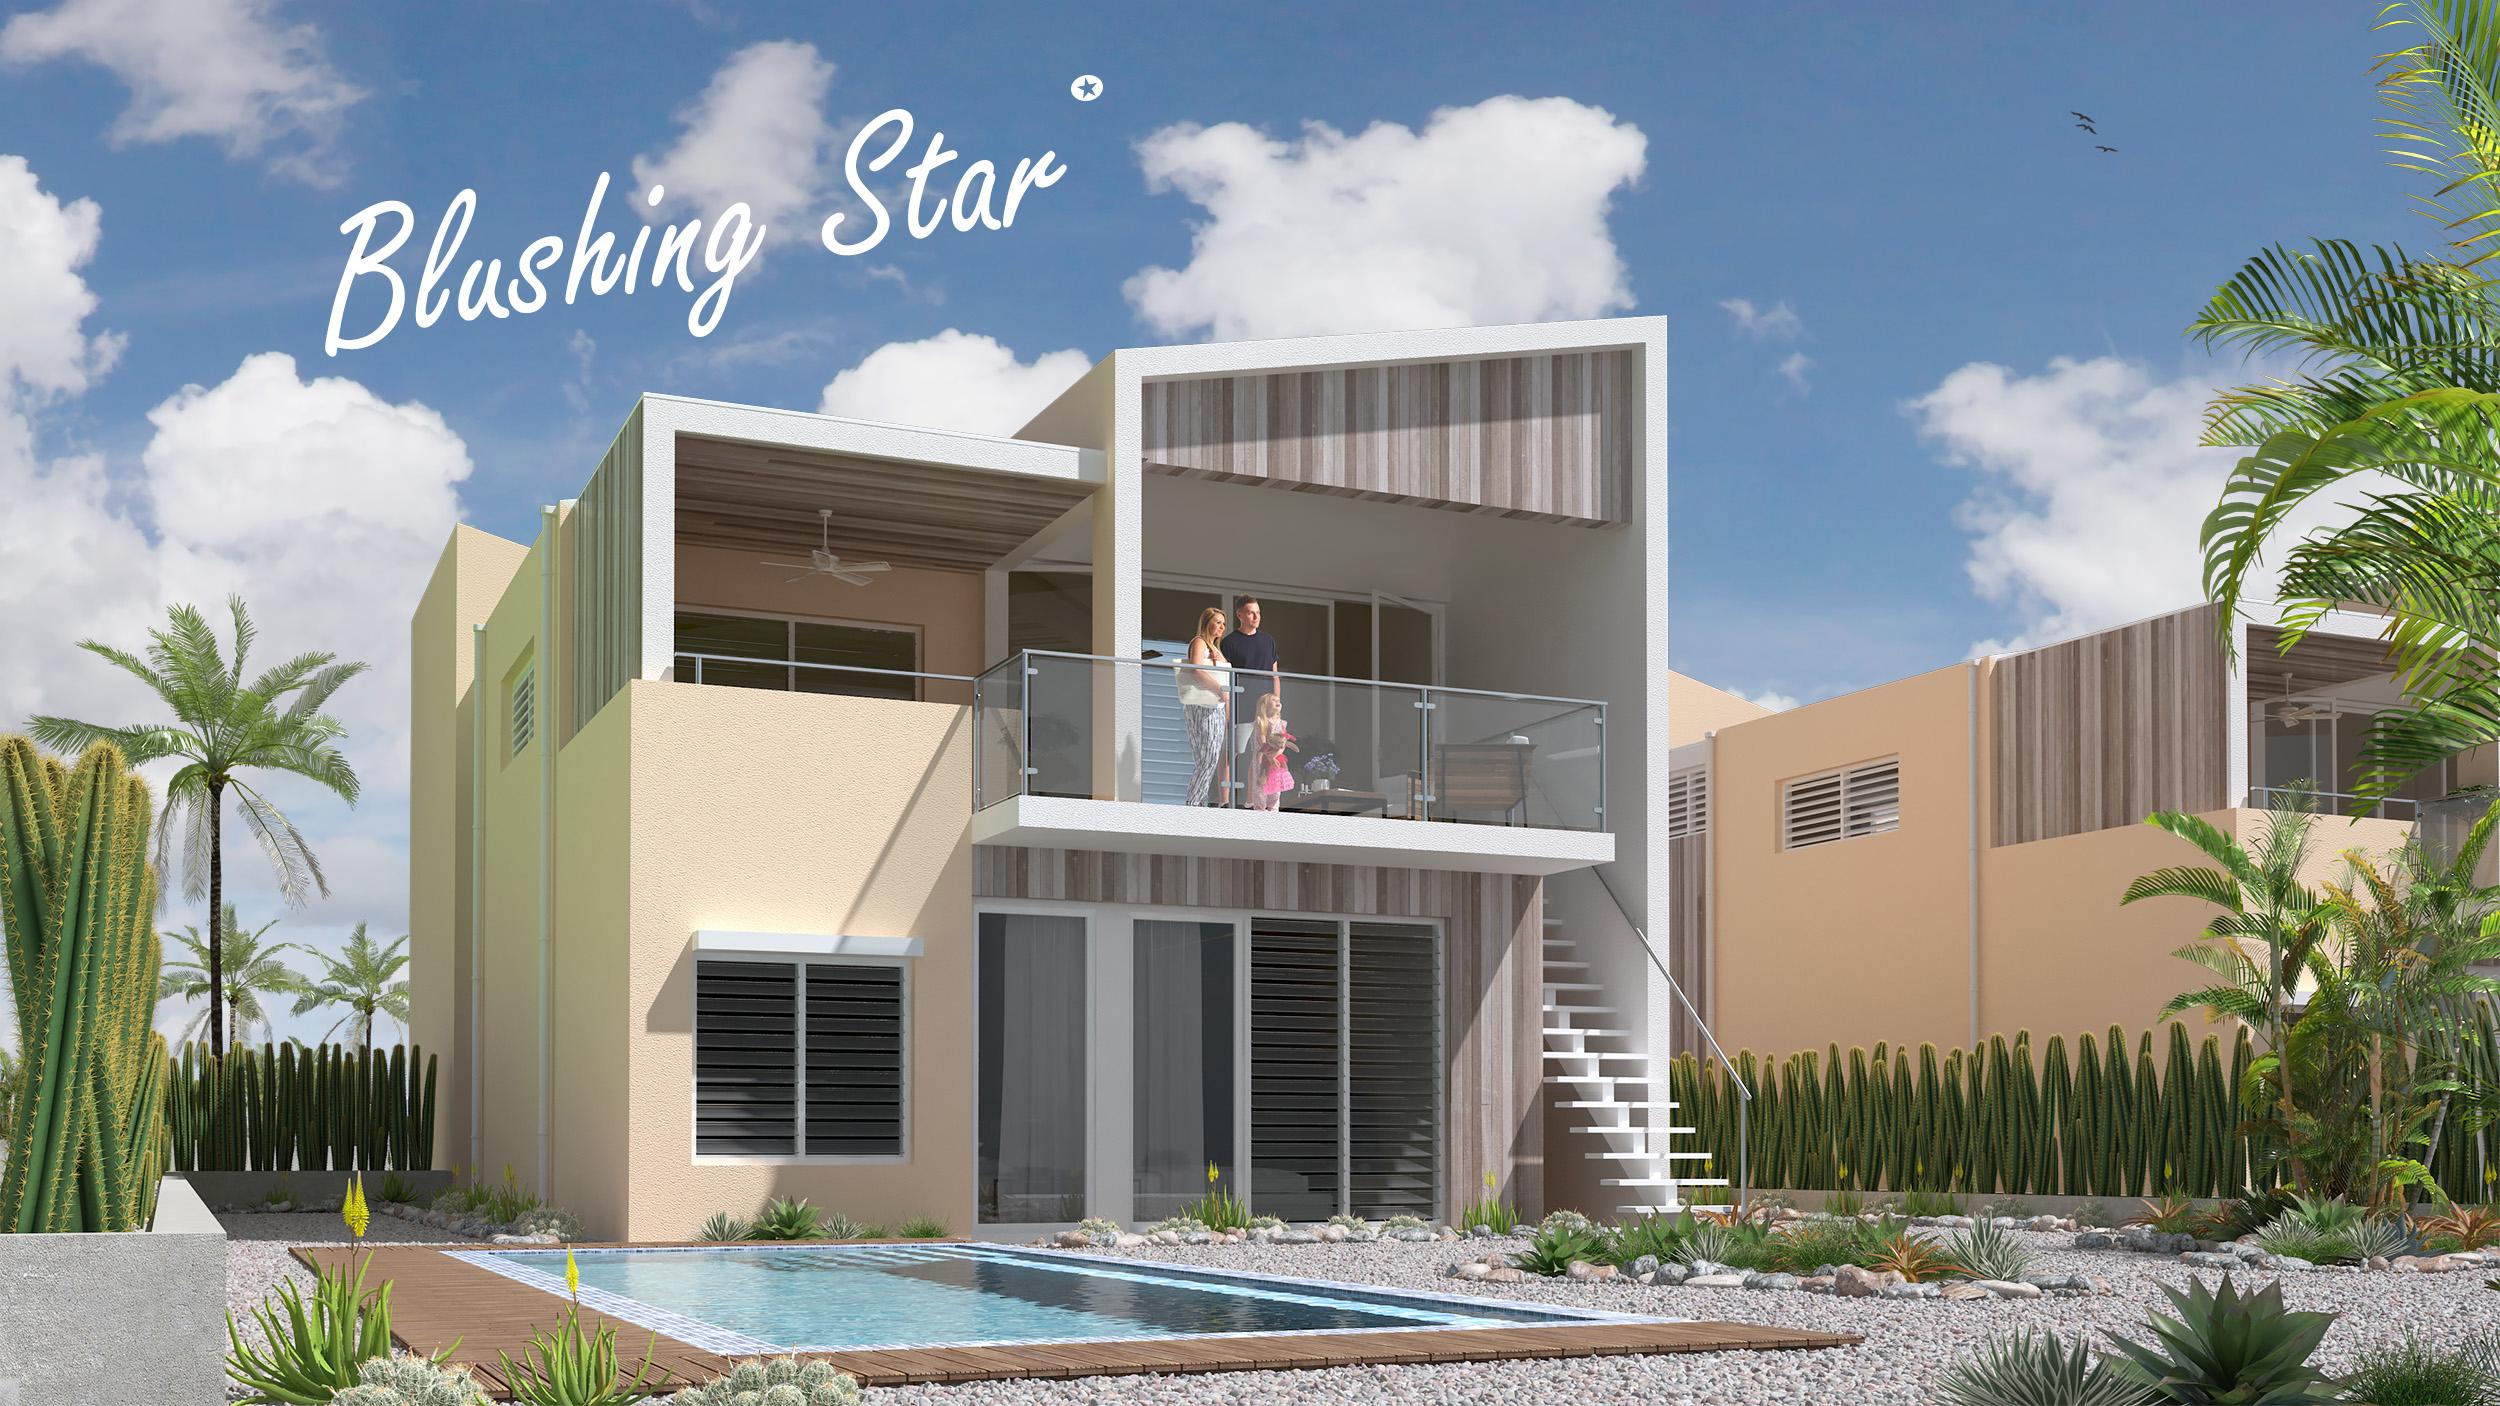 Delfins Villas Bonaire Blushing Star